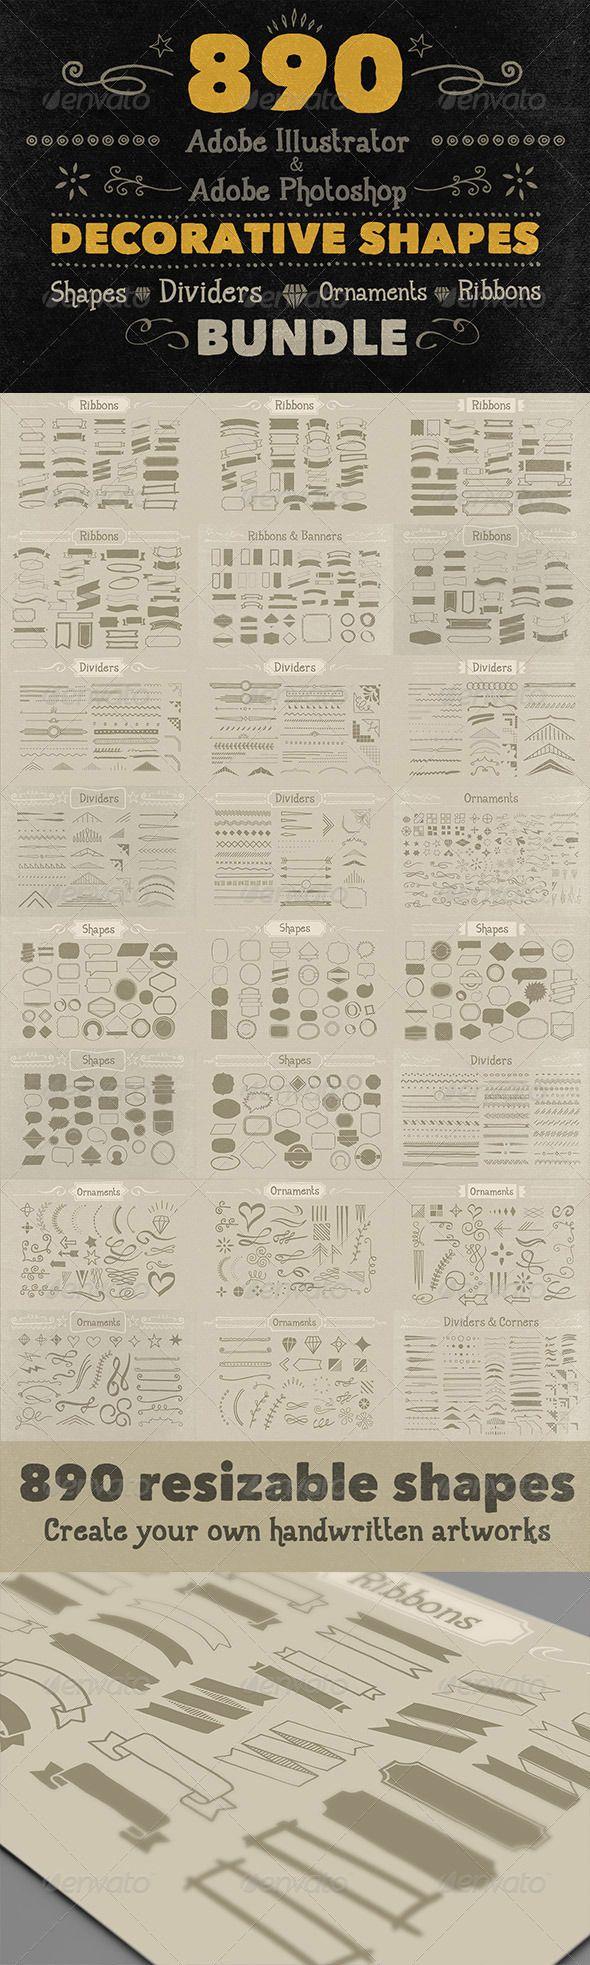 890 Handwritten Shapes - Bundle - http://graphicriver.net/item/890-handwritten-shapes-bundle/6058111?ref=cruzine